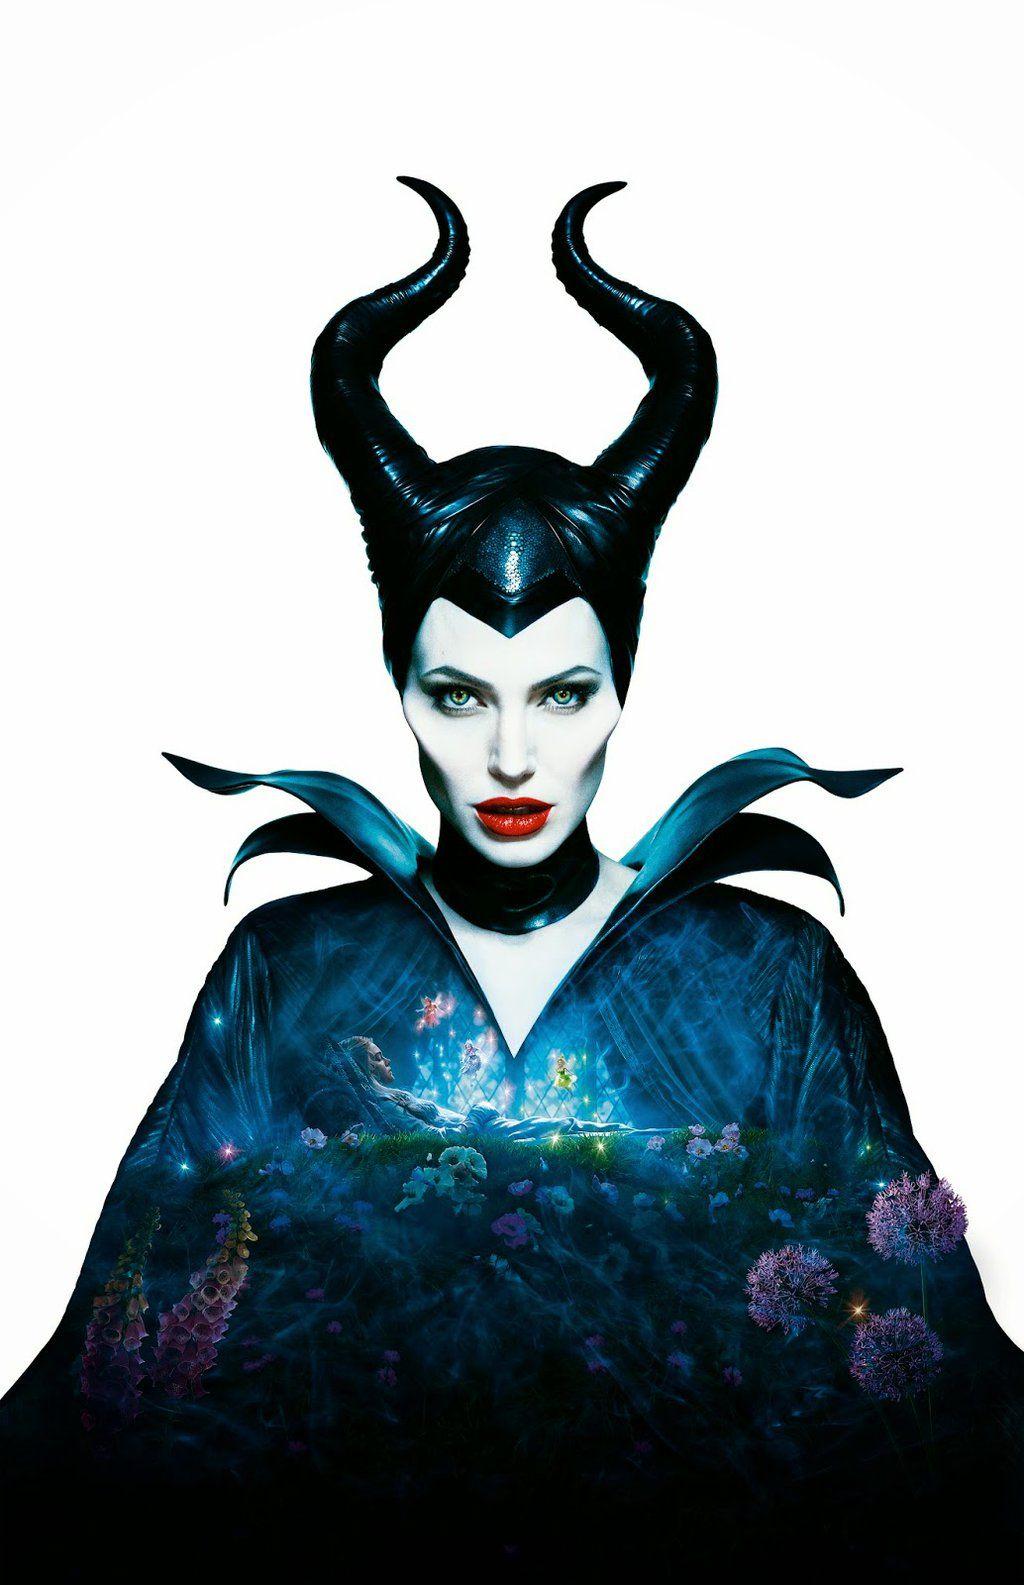 Maleficent Hi Res Textless Poster By Phet Van Burton